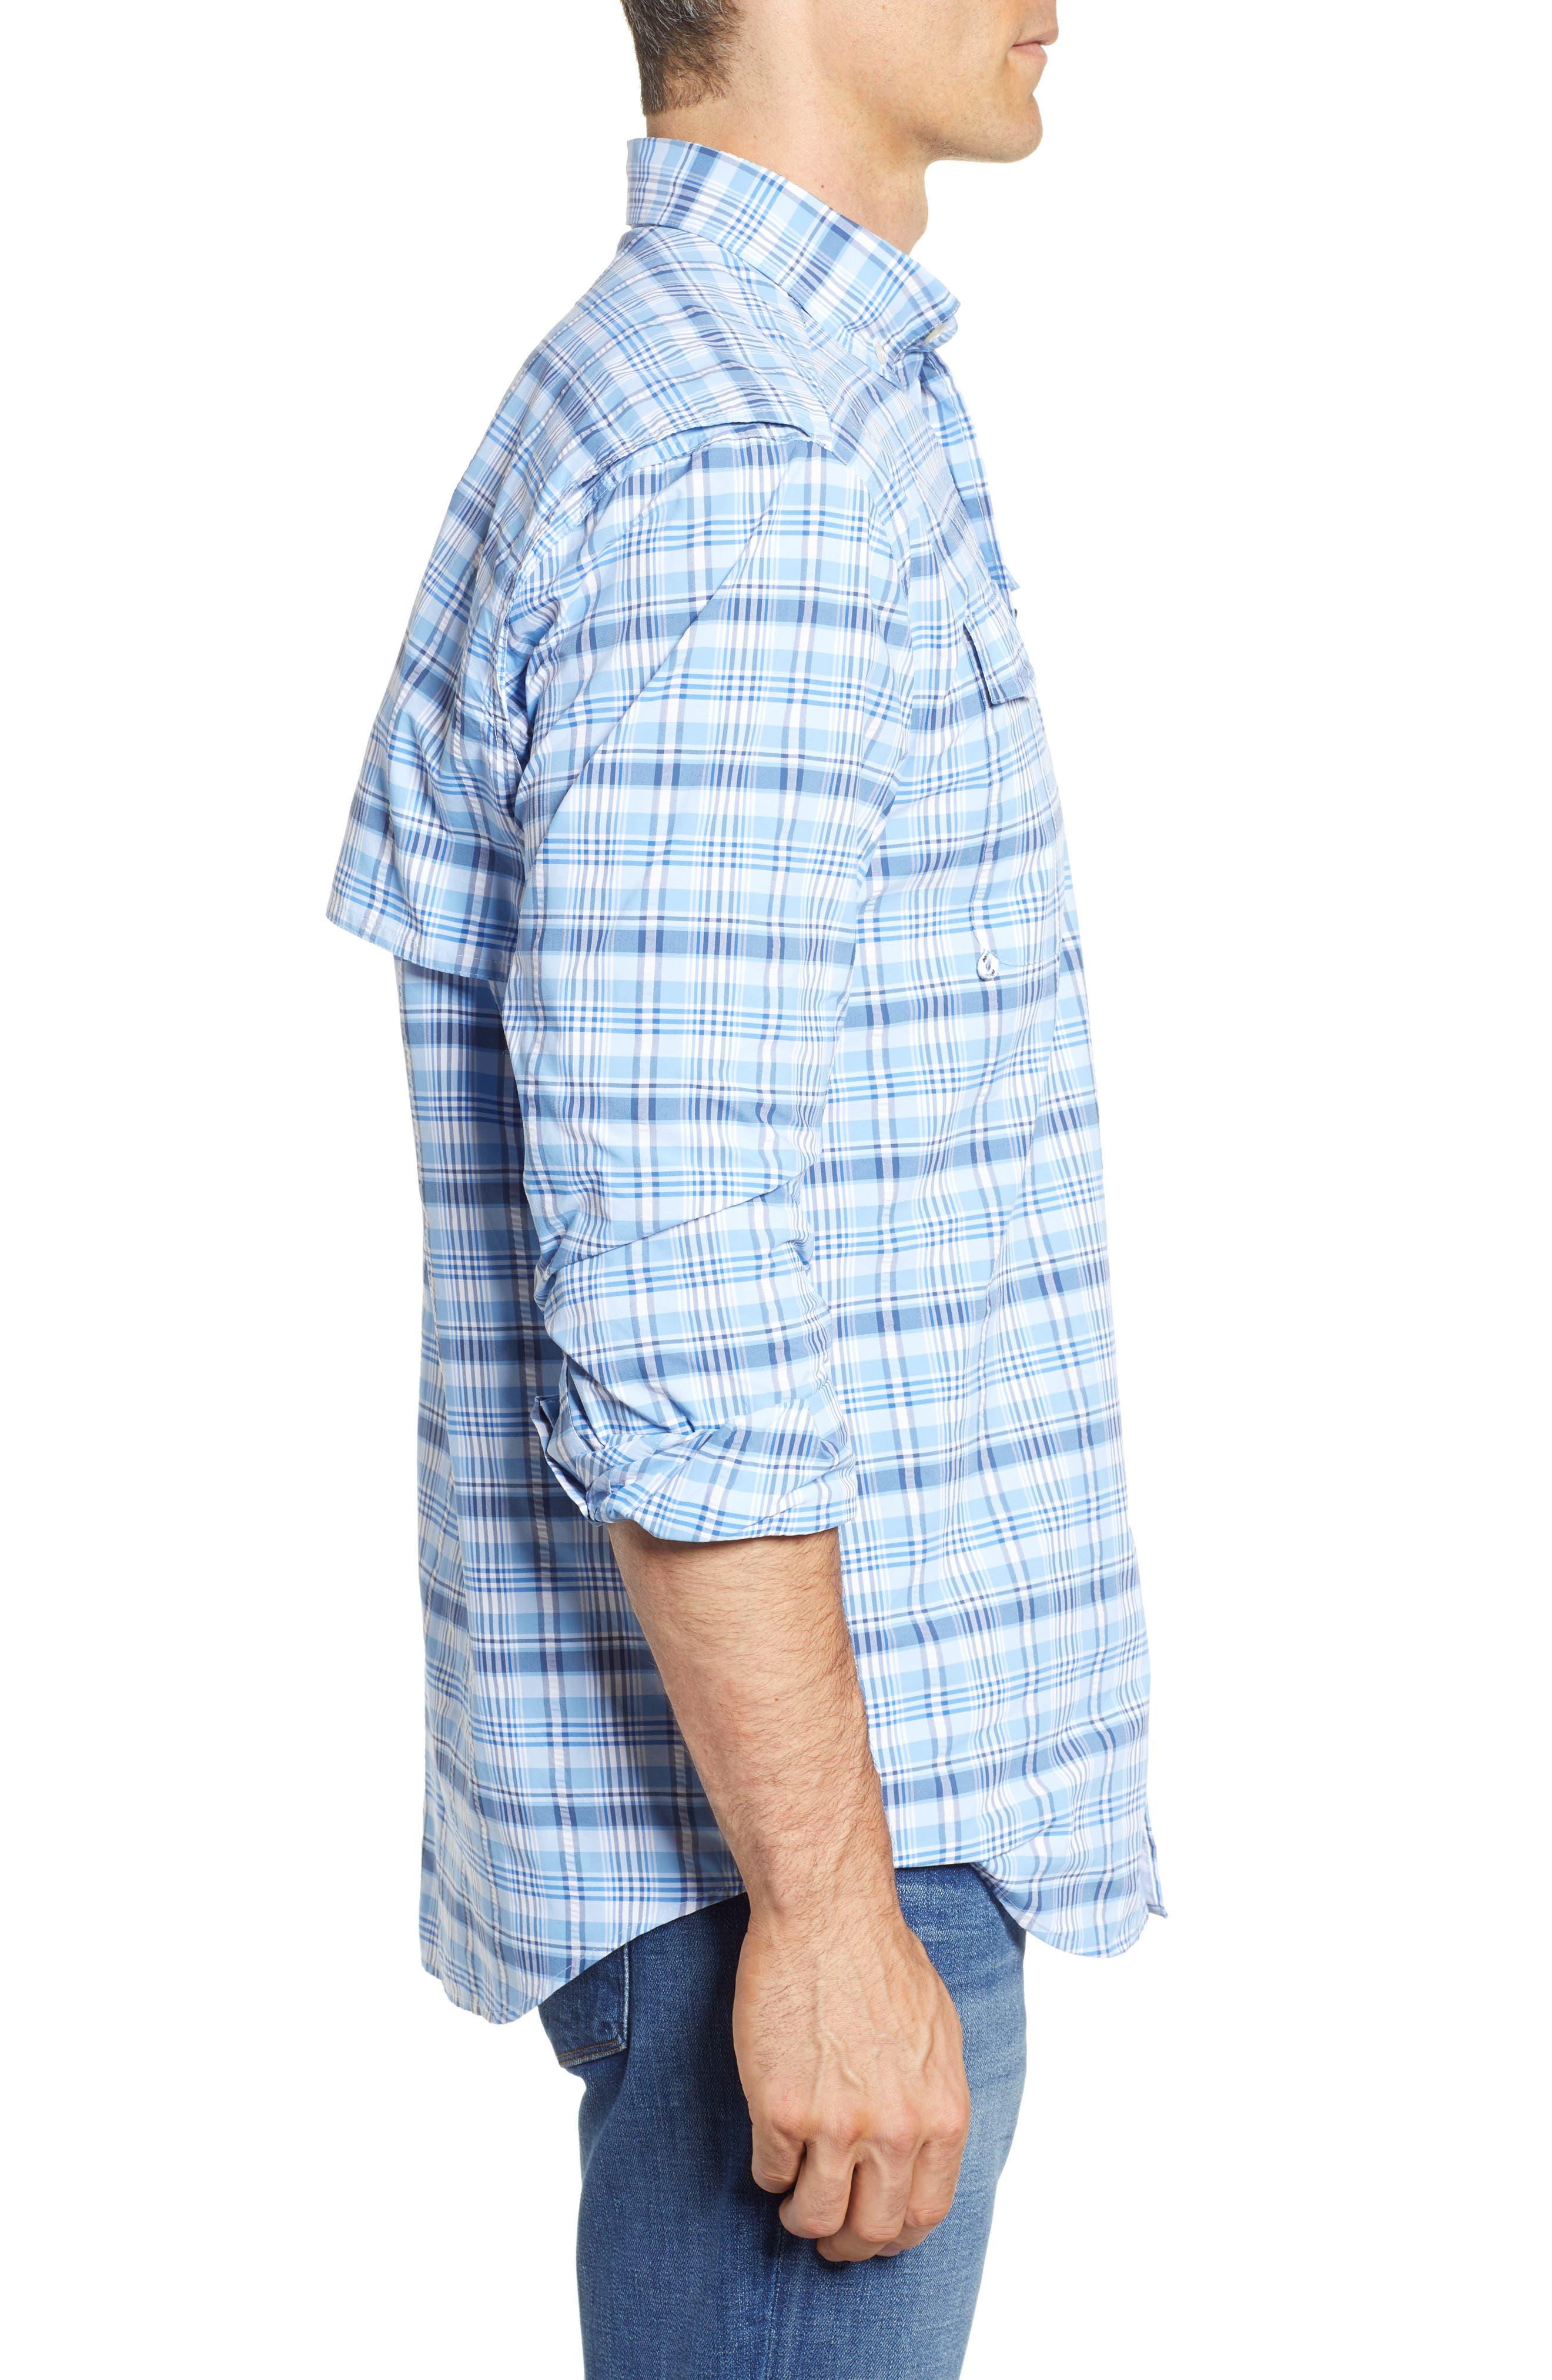 Prospect Hill Harbor Regular Fit Plaid Performance Sport Shirt,                             Alternate thumbnail 3, color,                             484